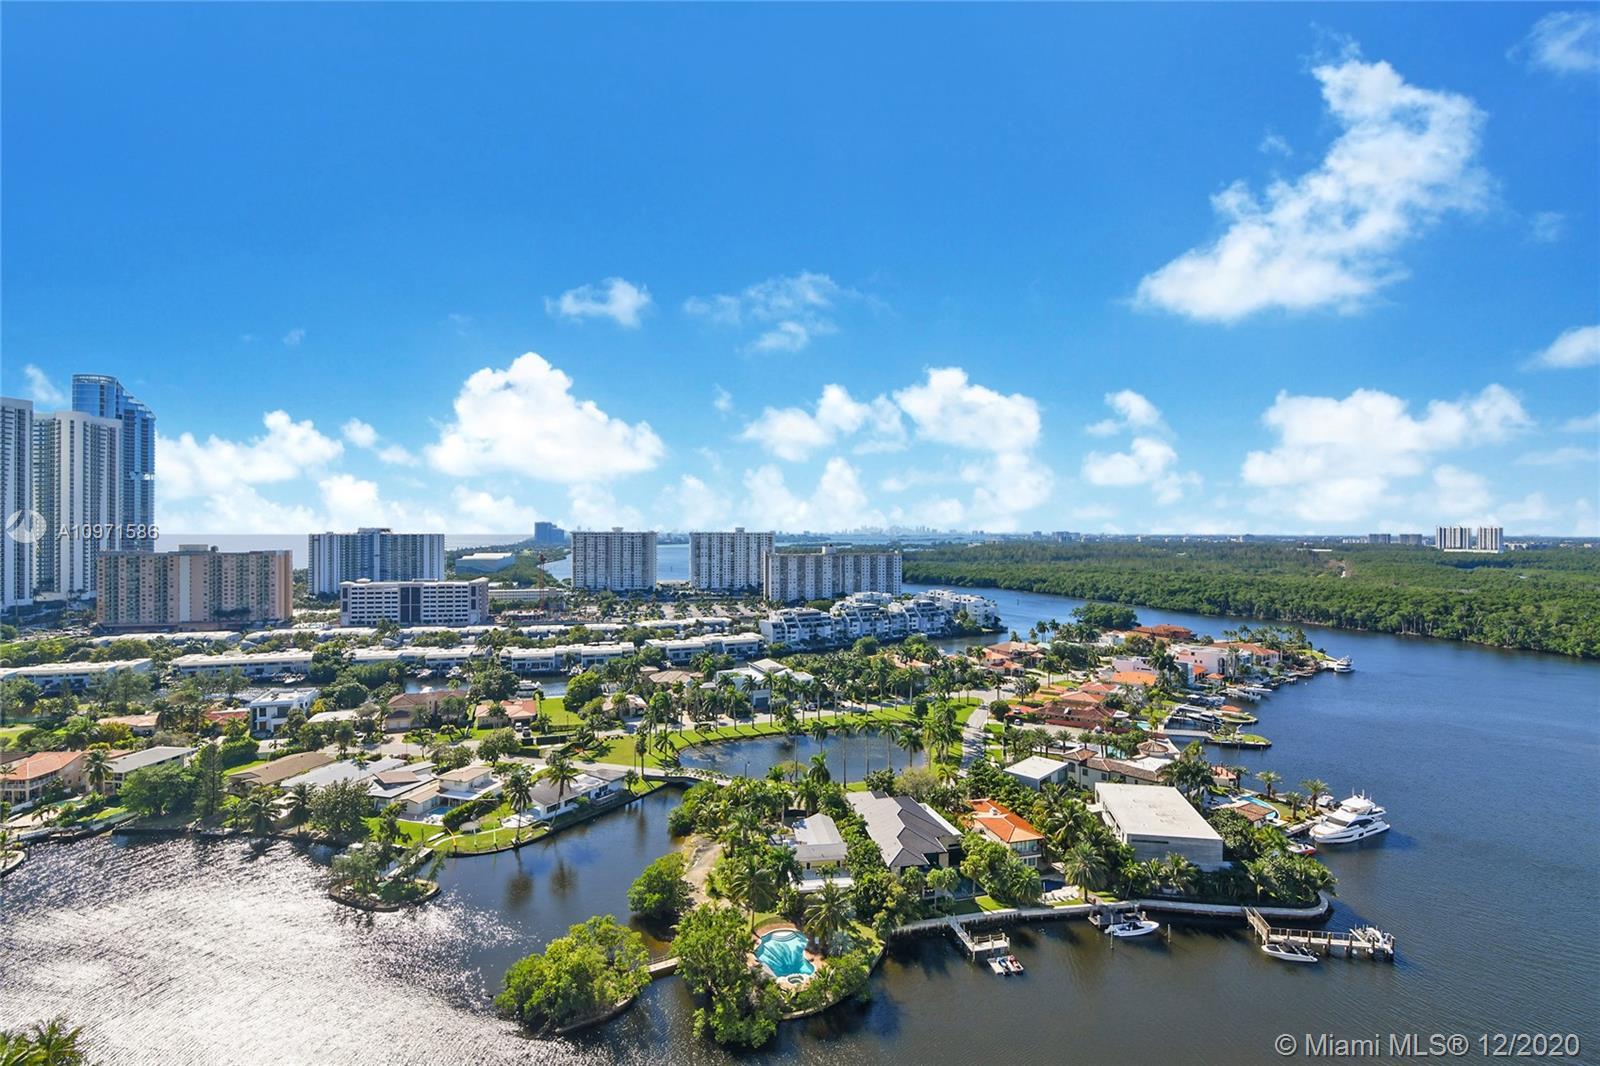 Parque Tower 2 #5-2204 - 330 Sunny Isles Blvd #5-2204, Sunny Isles Beach, FL 33160